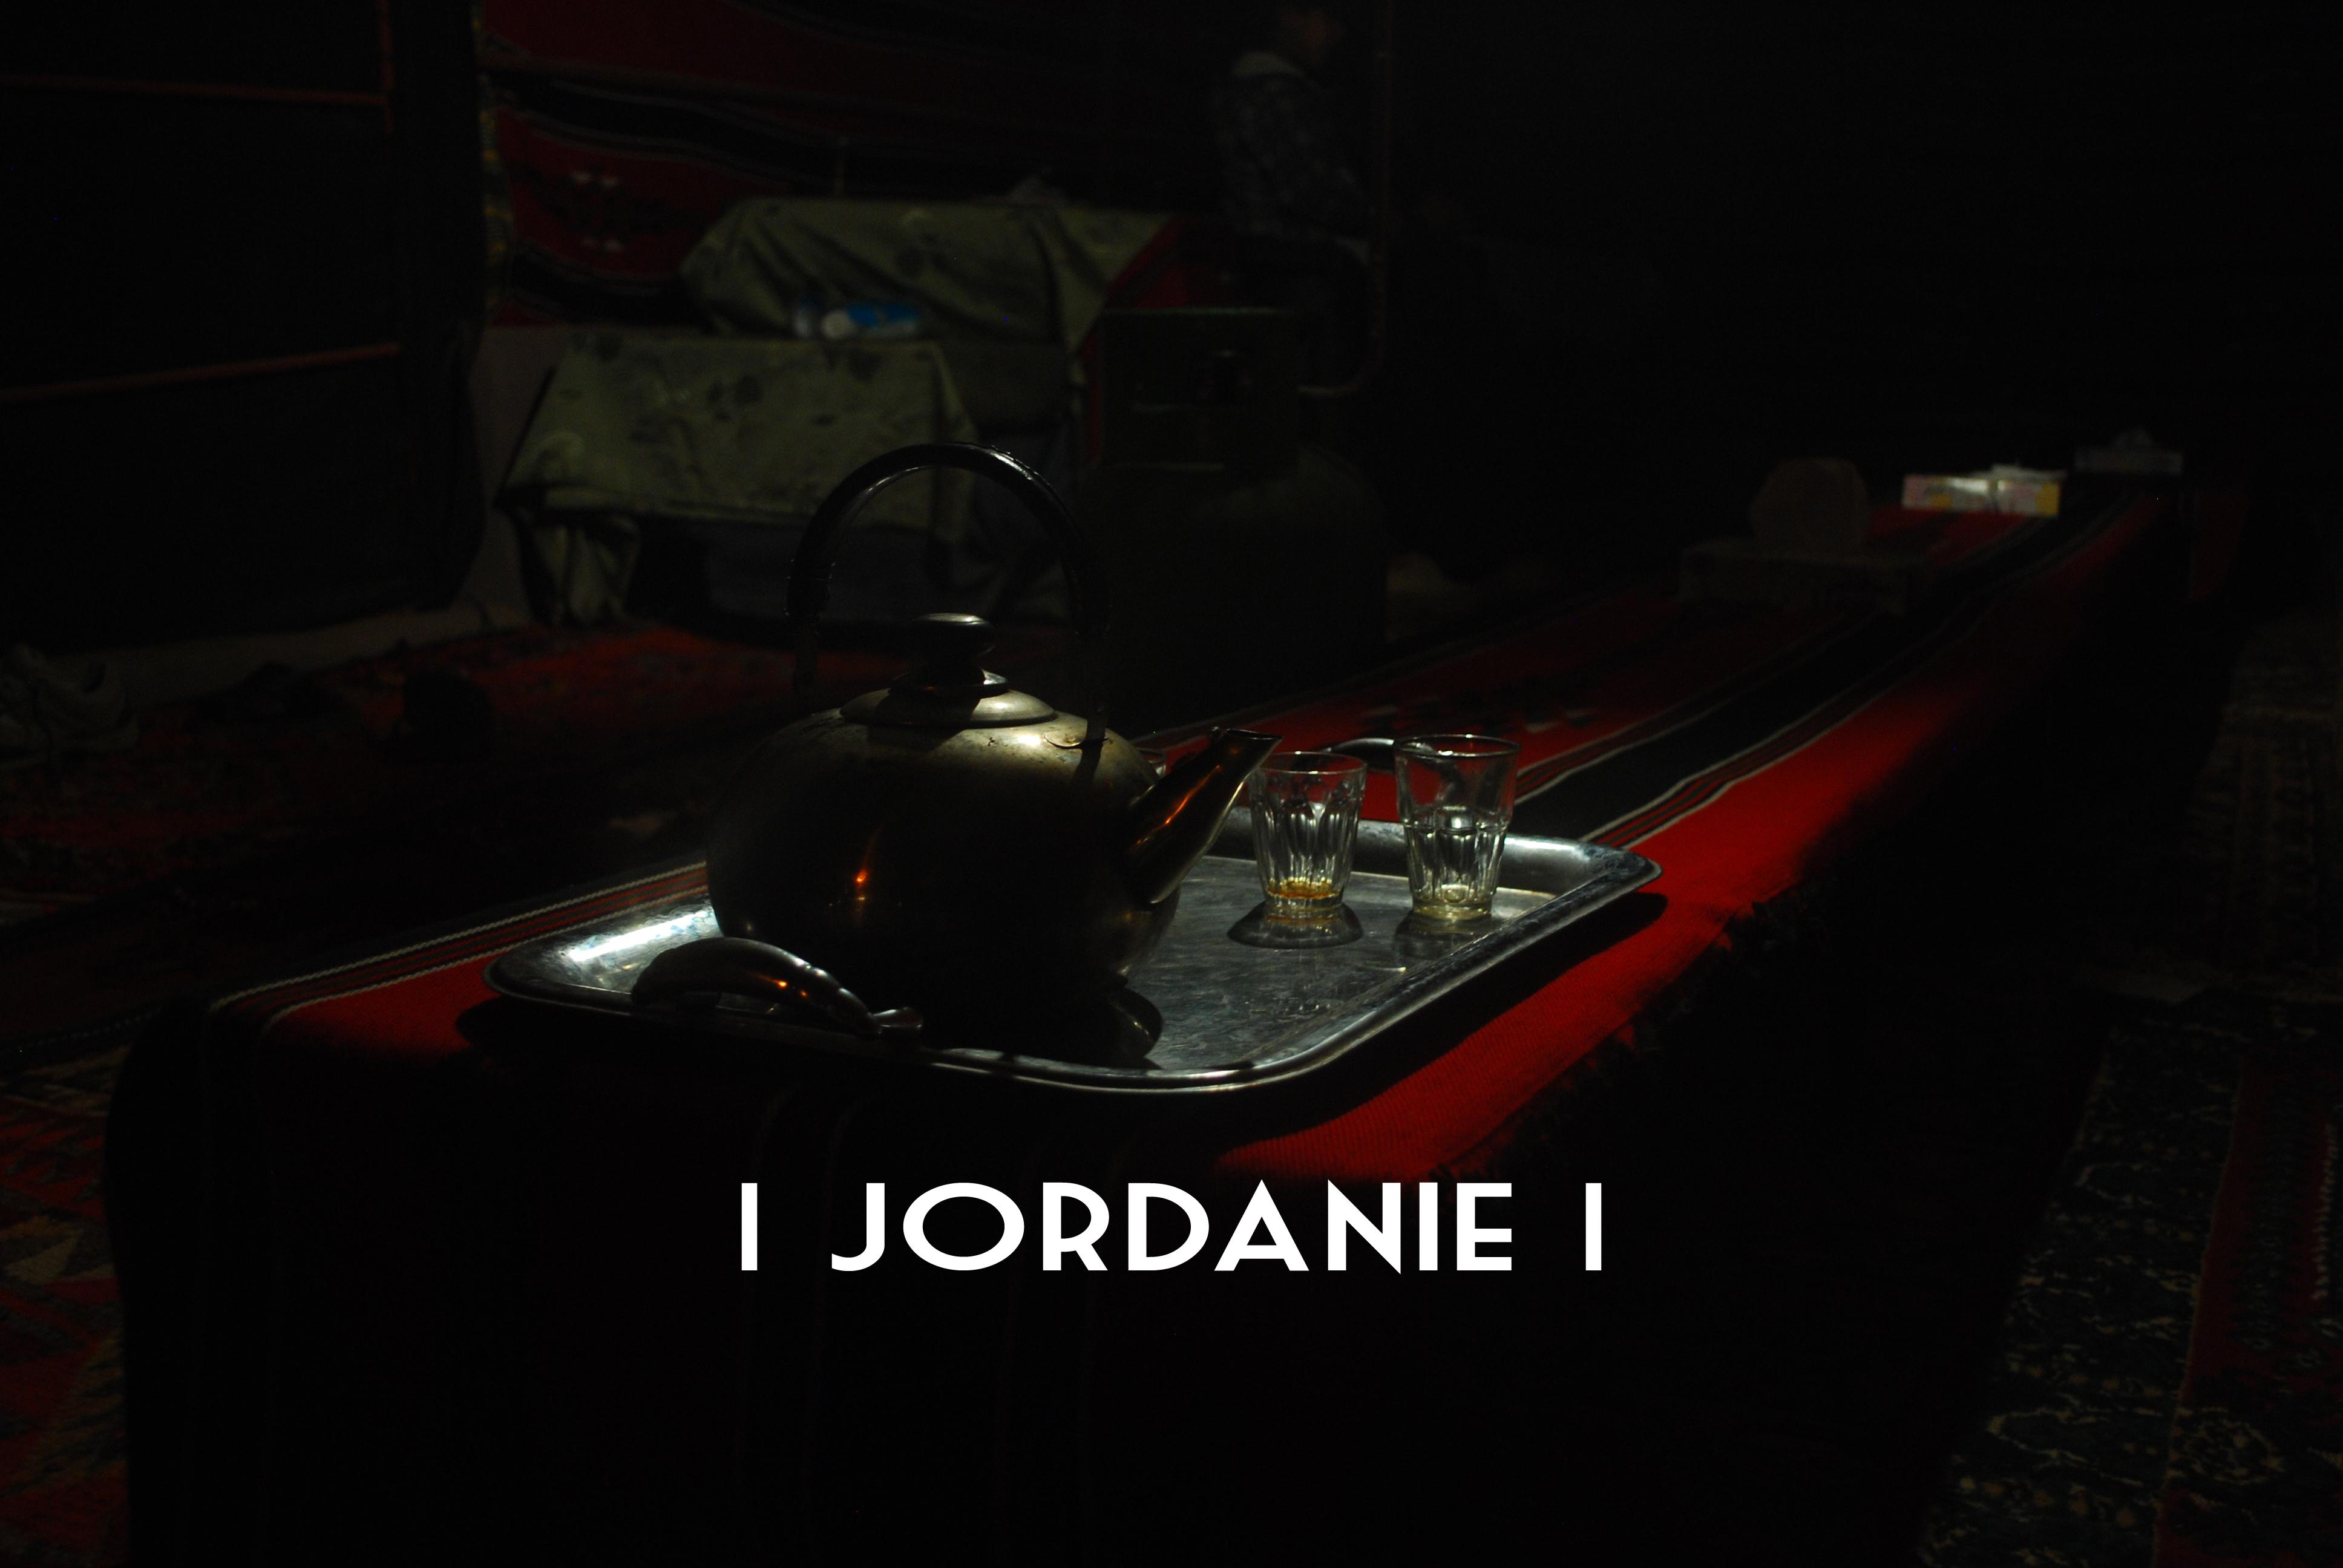 jordanie-by-le-polyedre